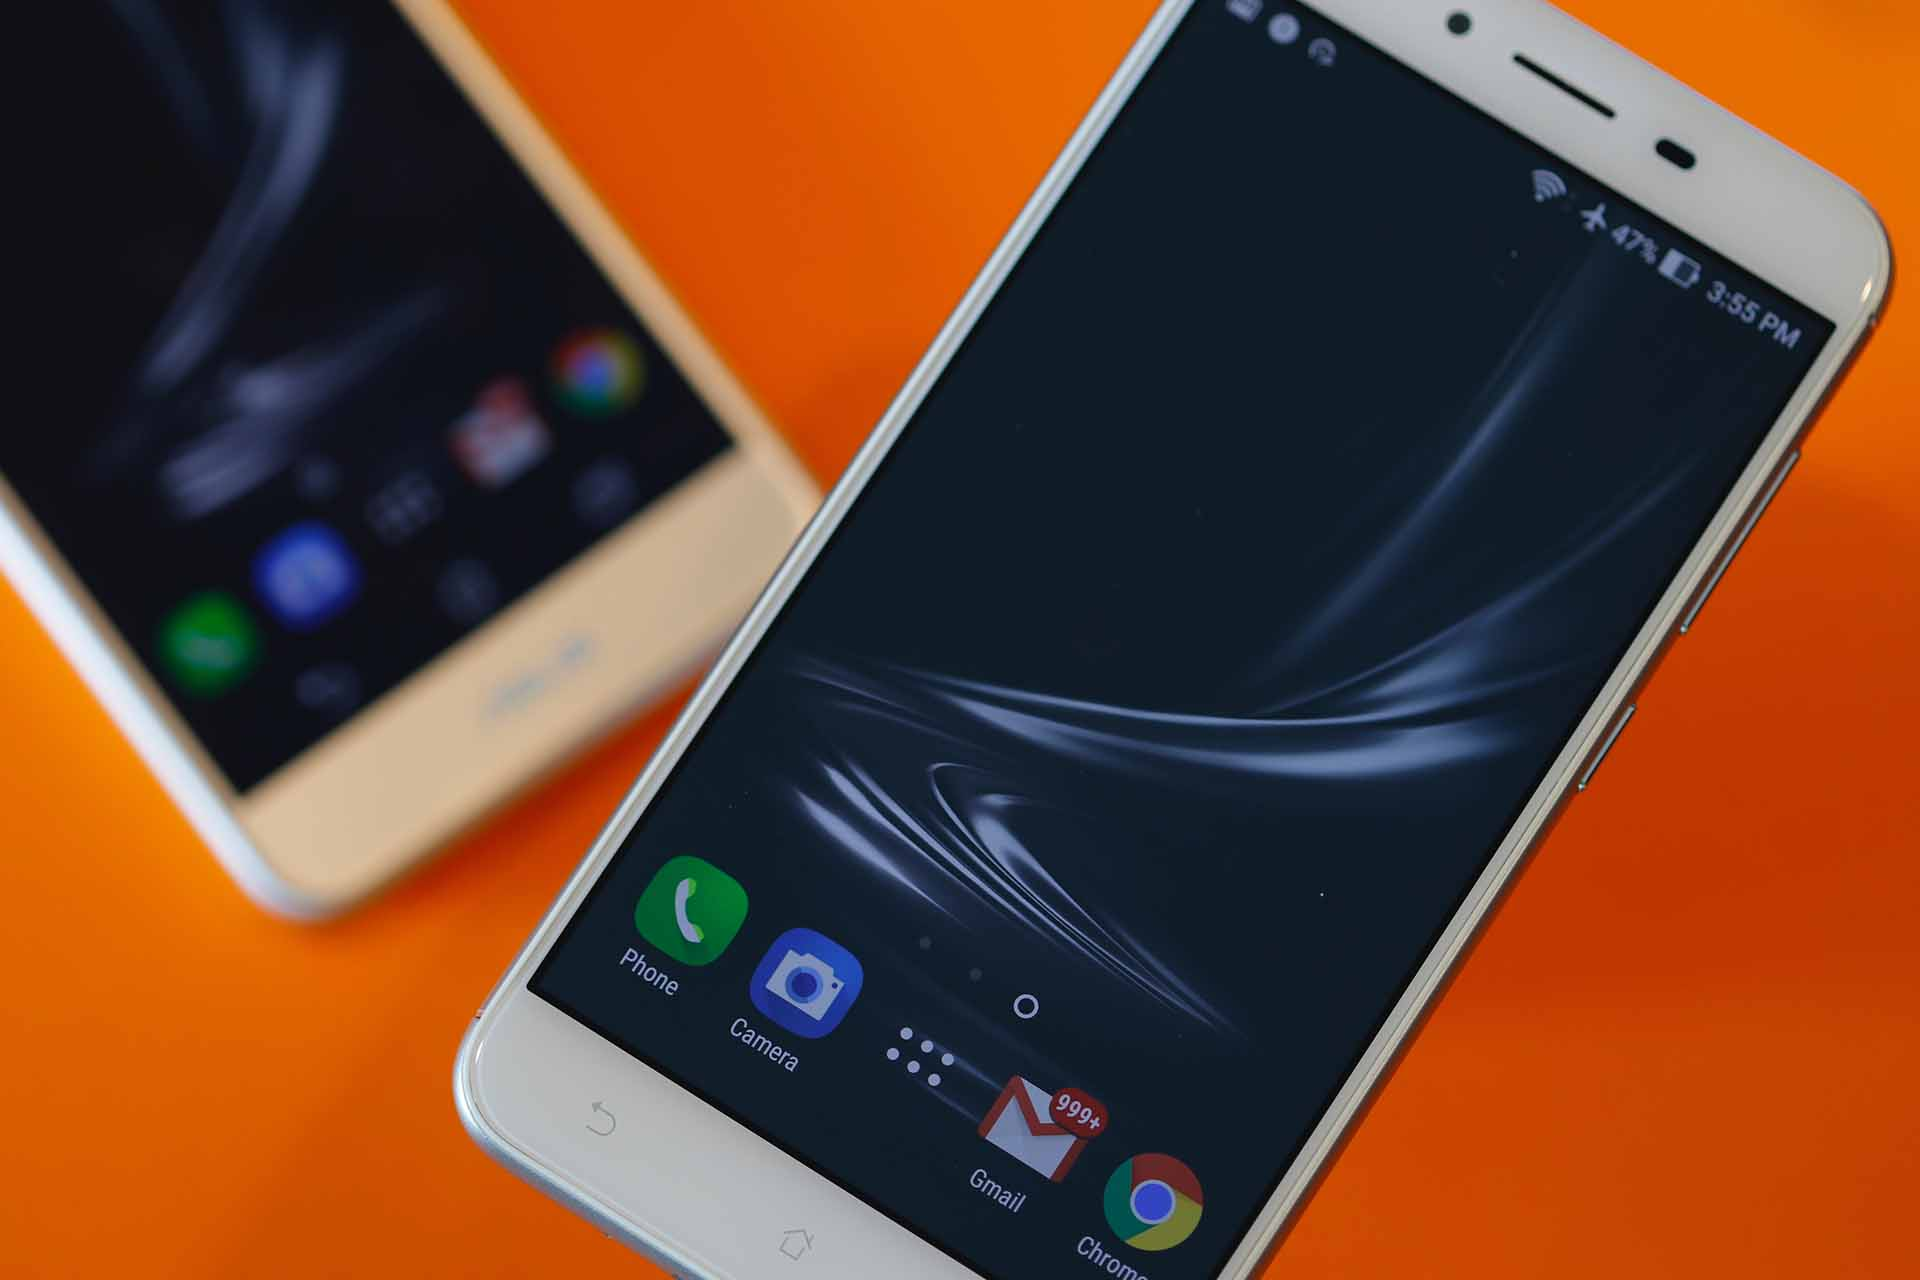 The 7 Best Smartphones In The Philippines In 2016